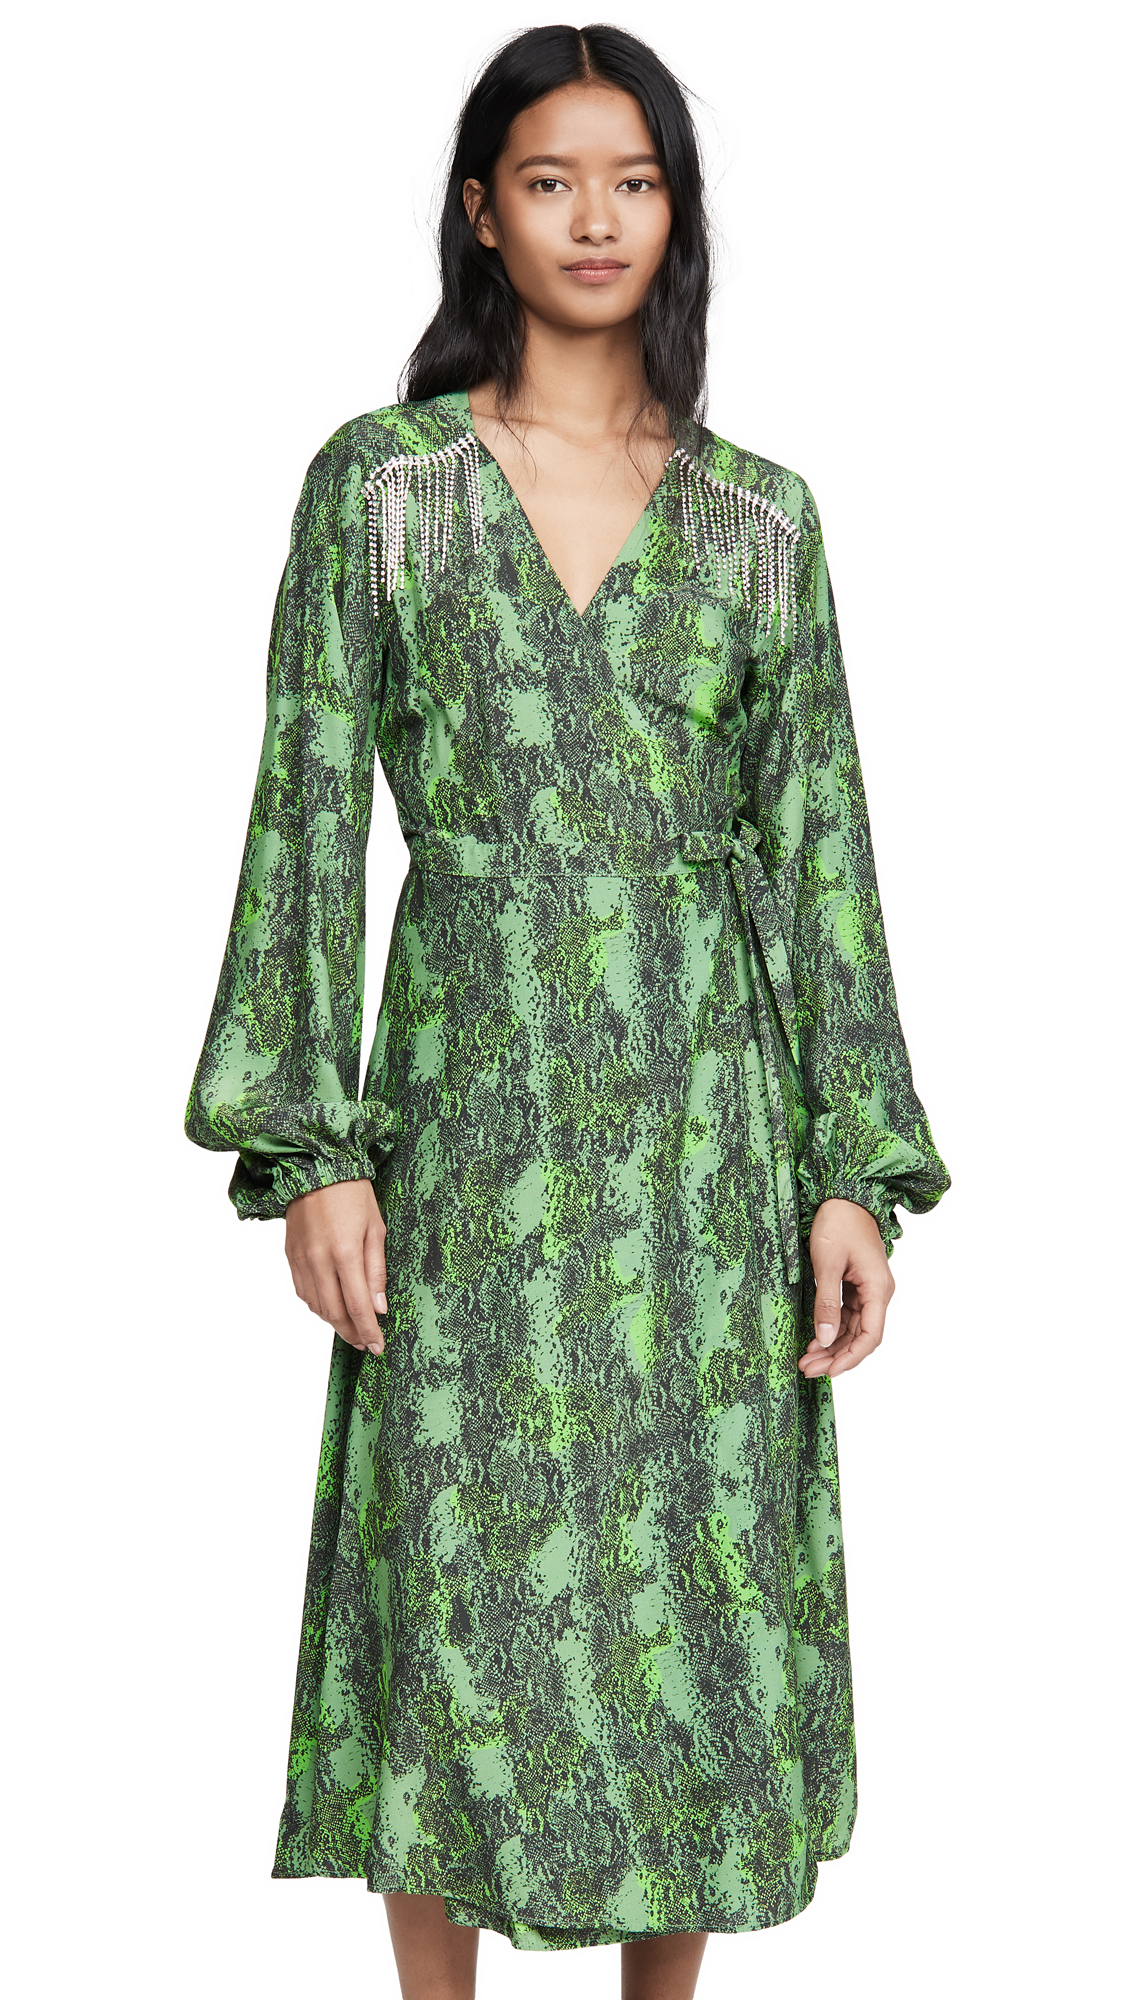 ROTATE Kira Dress - 50% Off Sale